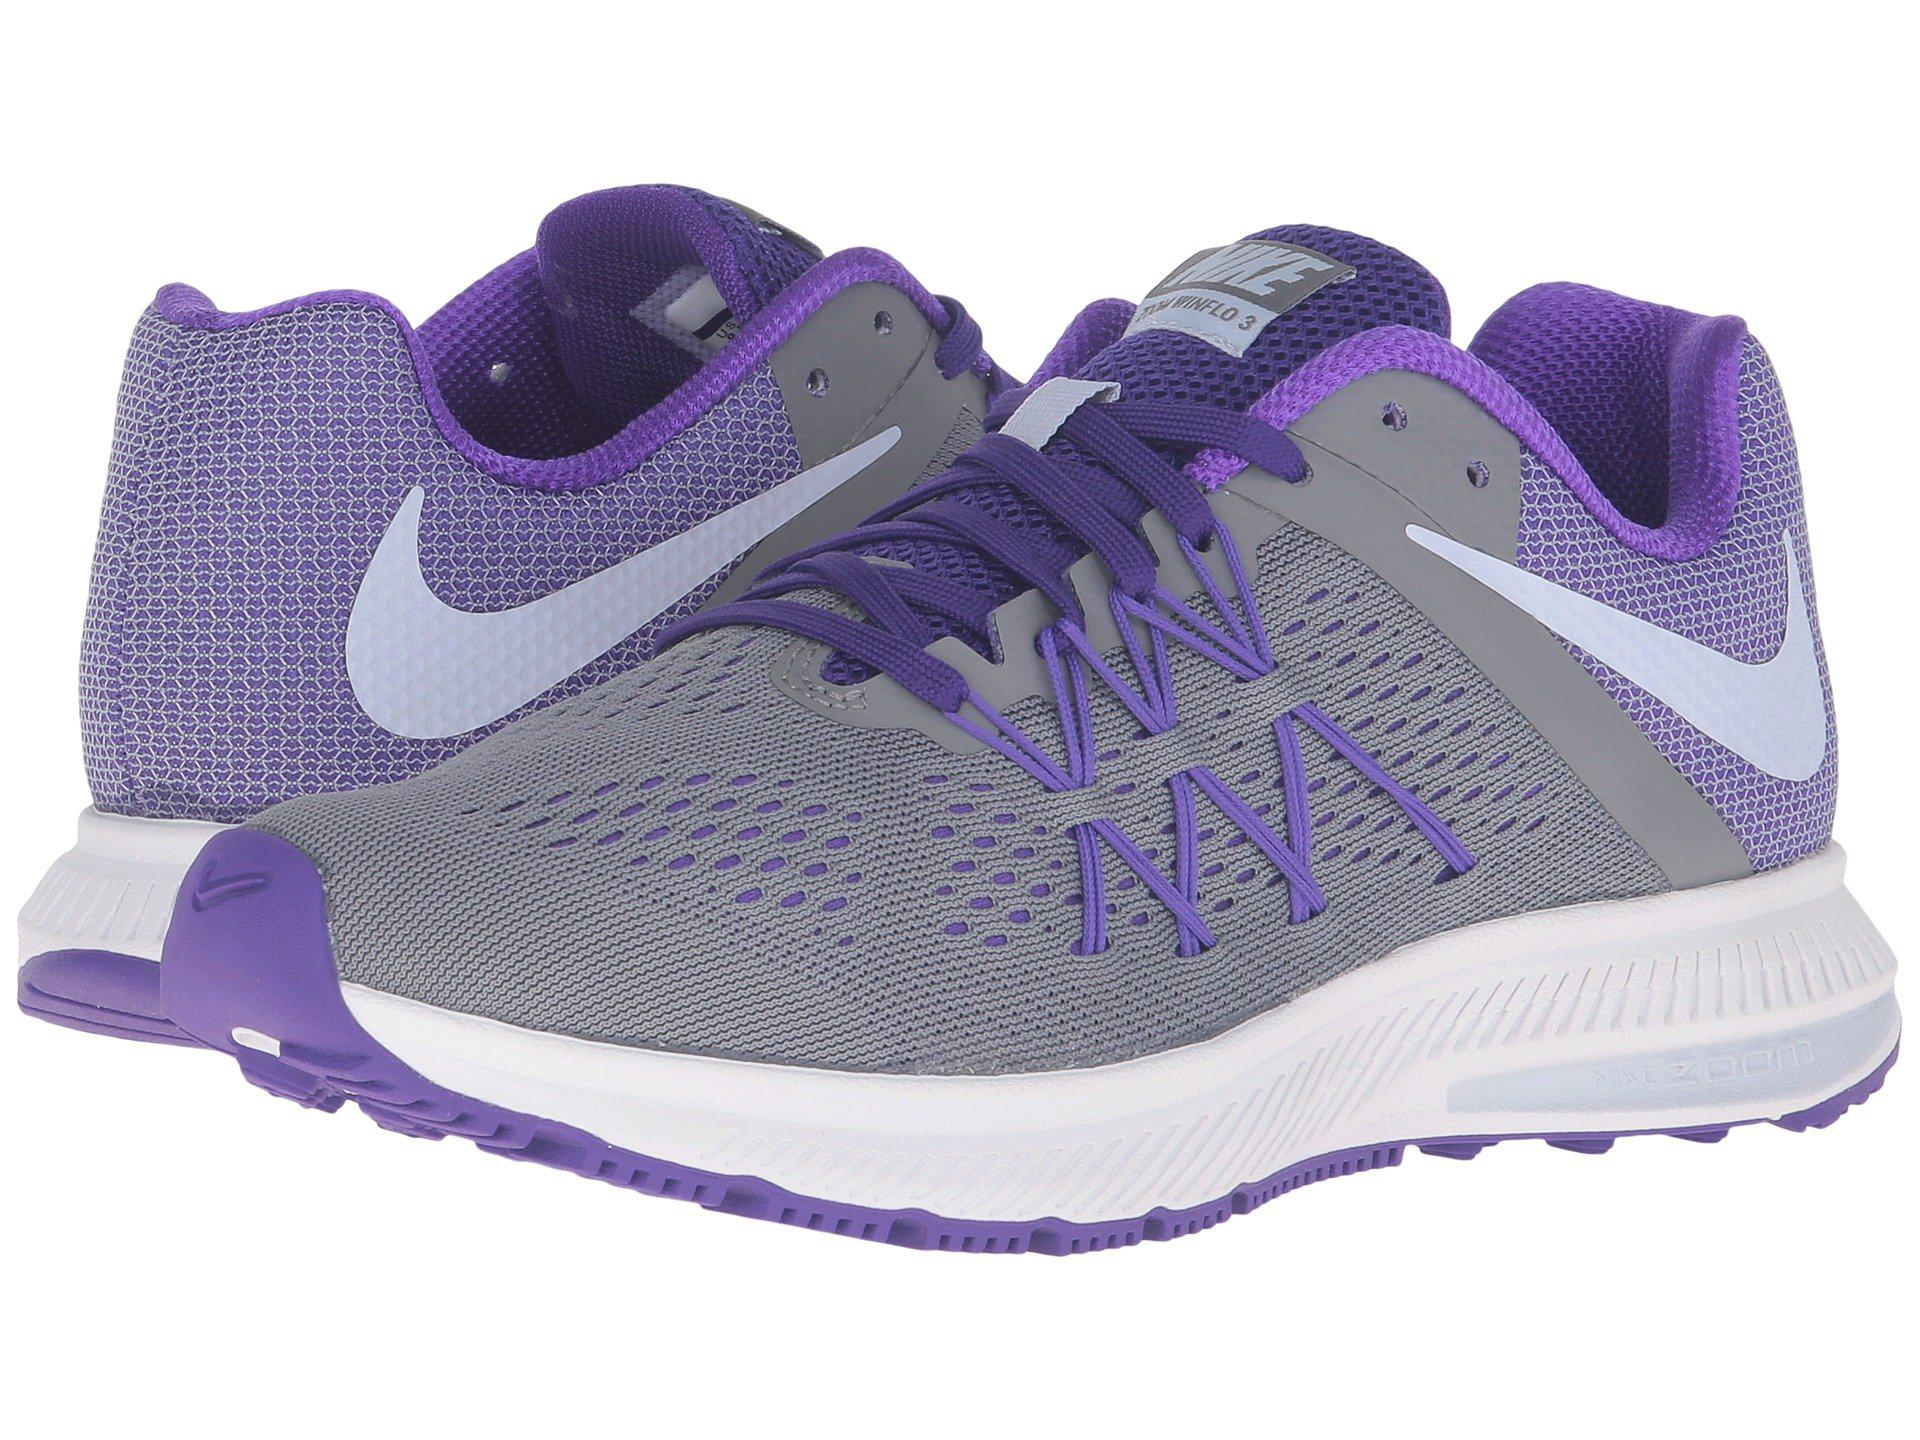 huge selection of d7300 301c4 Nike Zoom Winflo 3 in Purple - Lyst